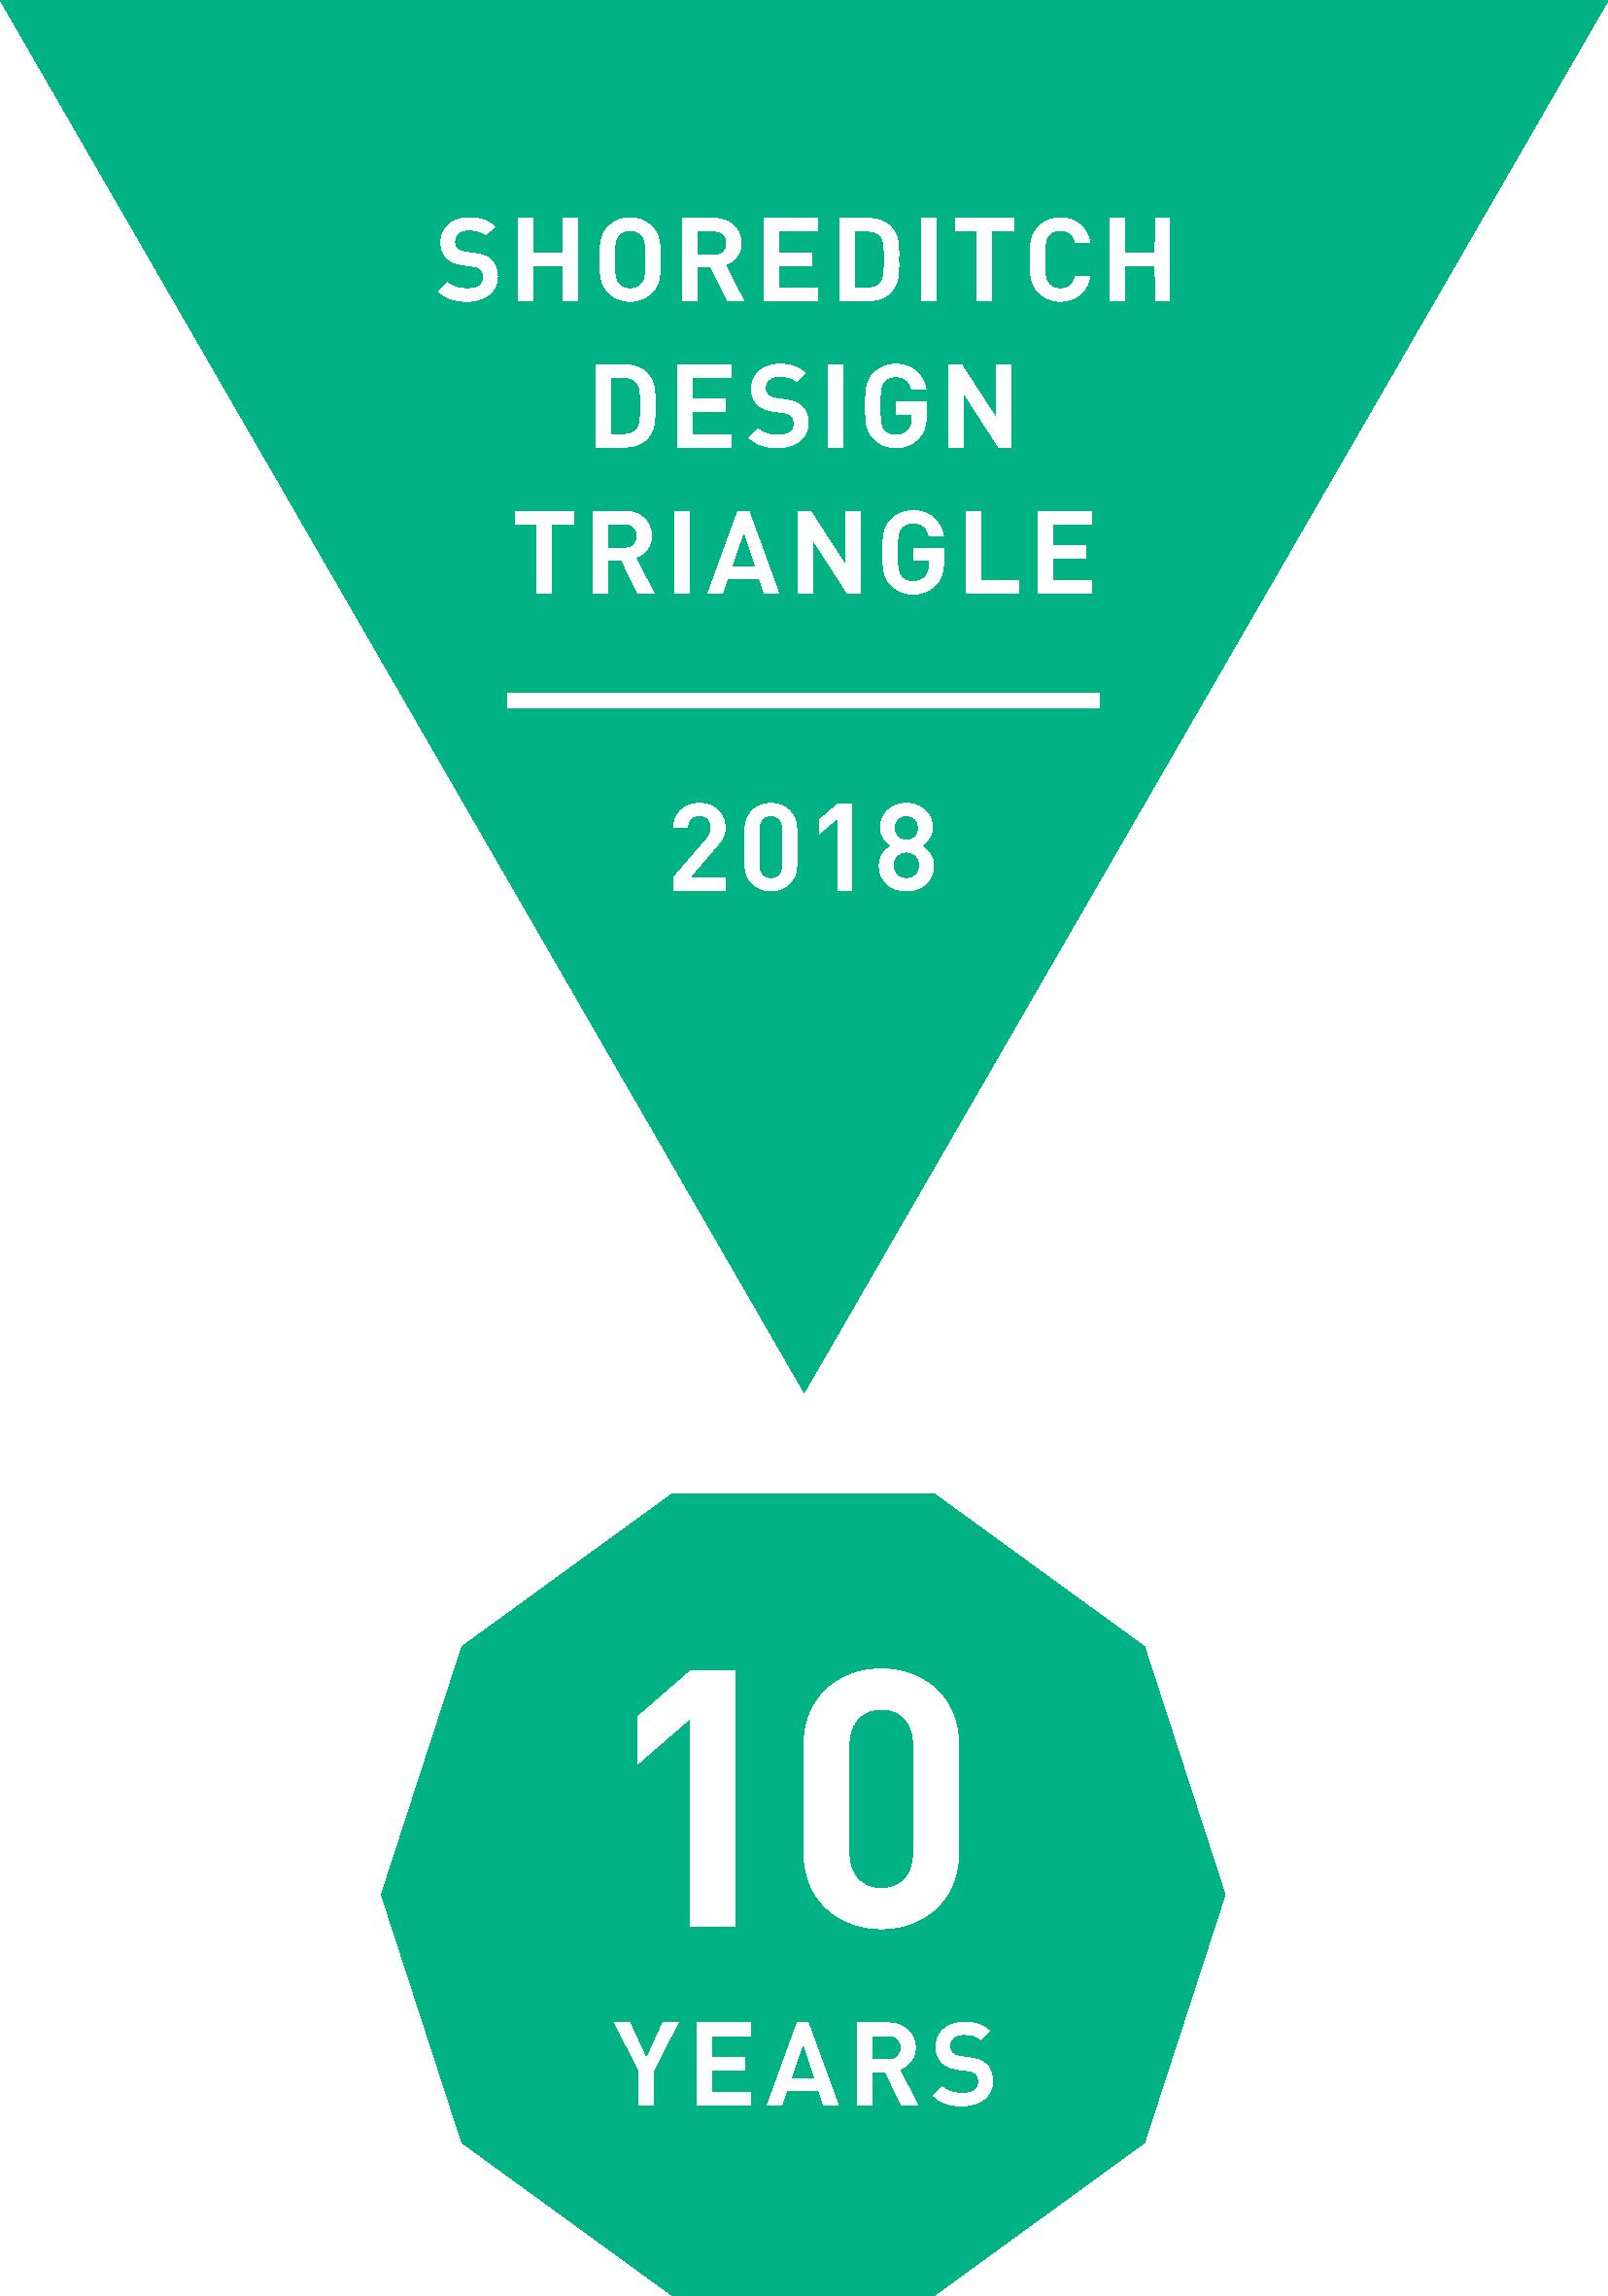 SDT18 Logo 10YRS - Green